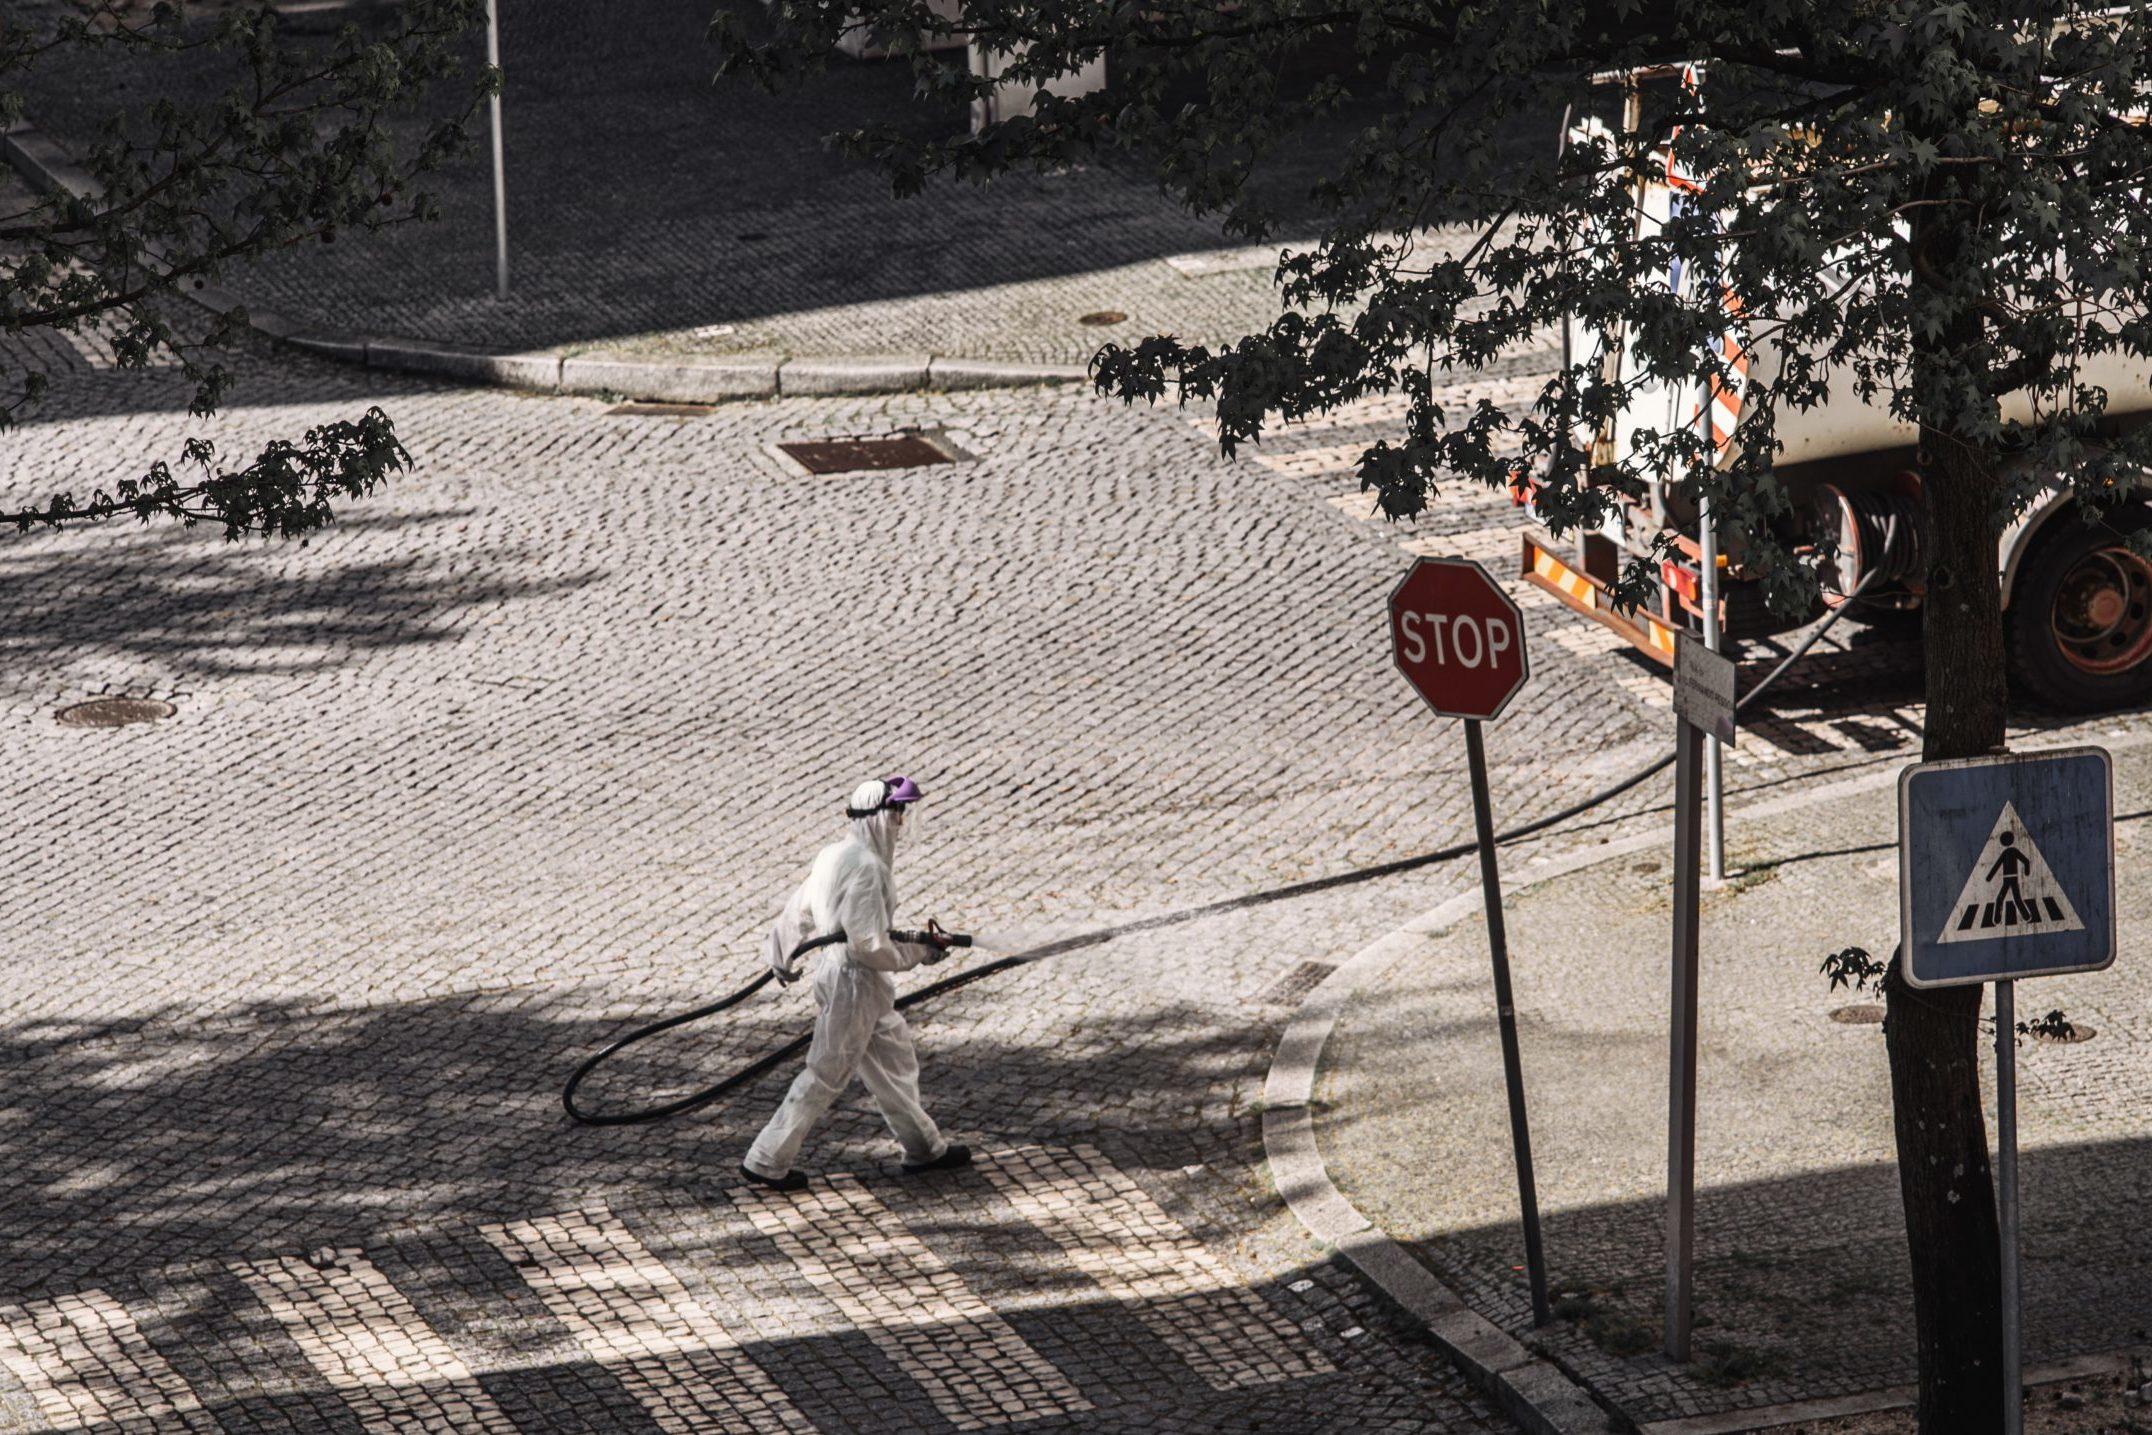 man in hazmat suit cleaning streets (photo credit: unsplash.com)